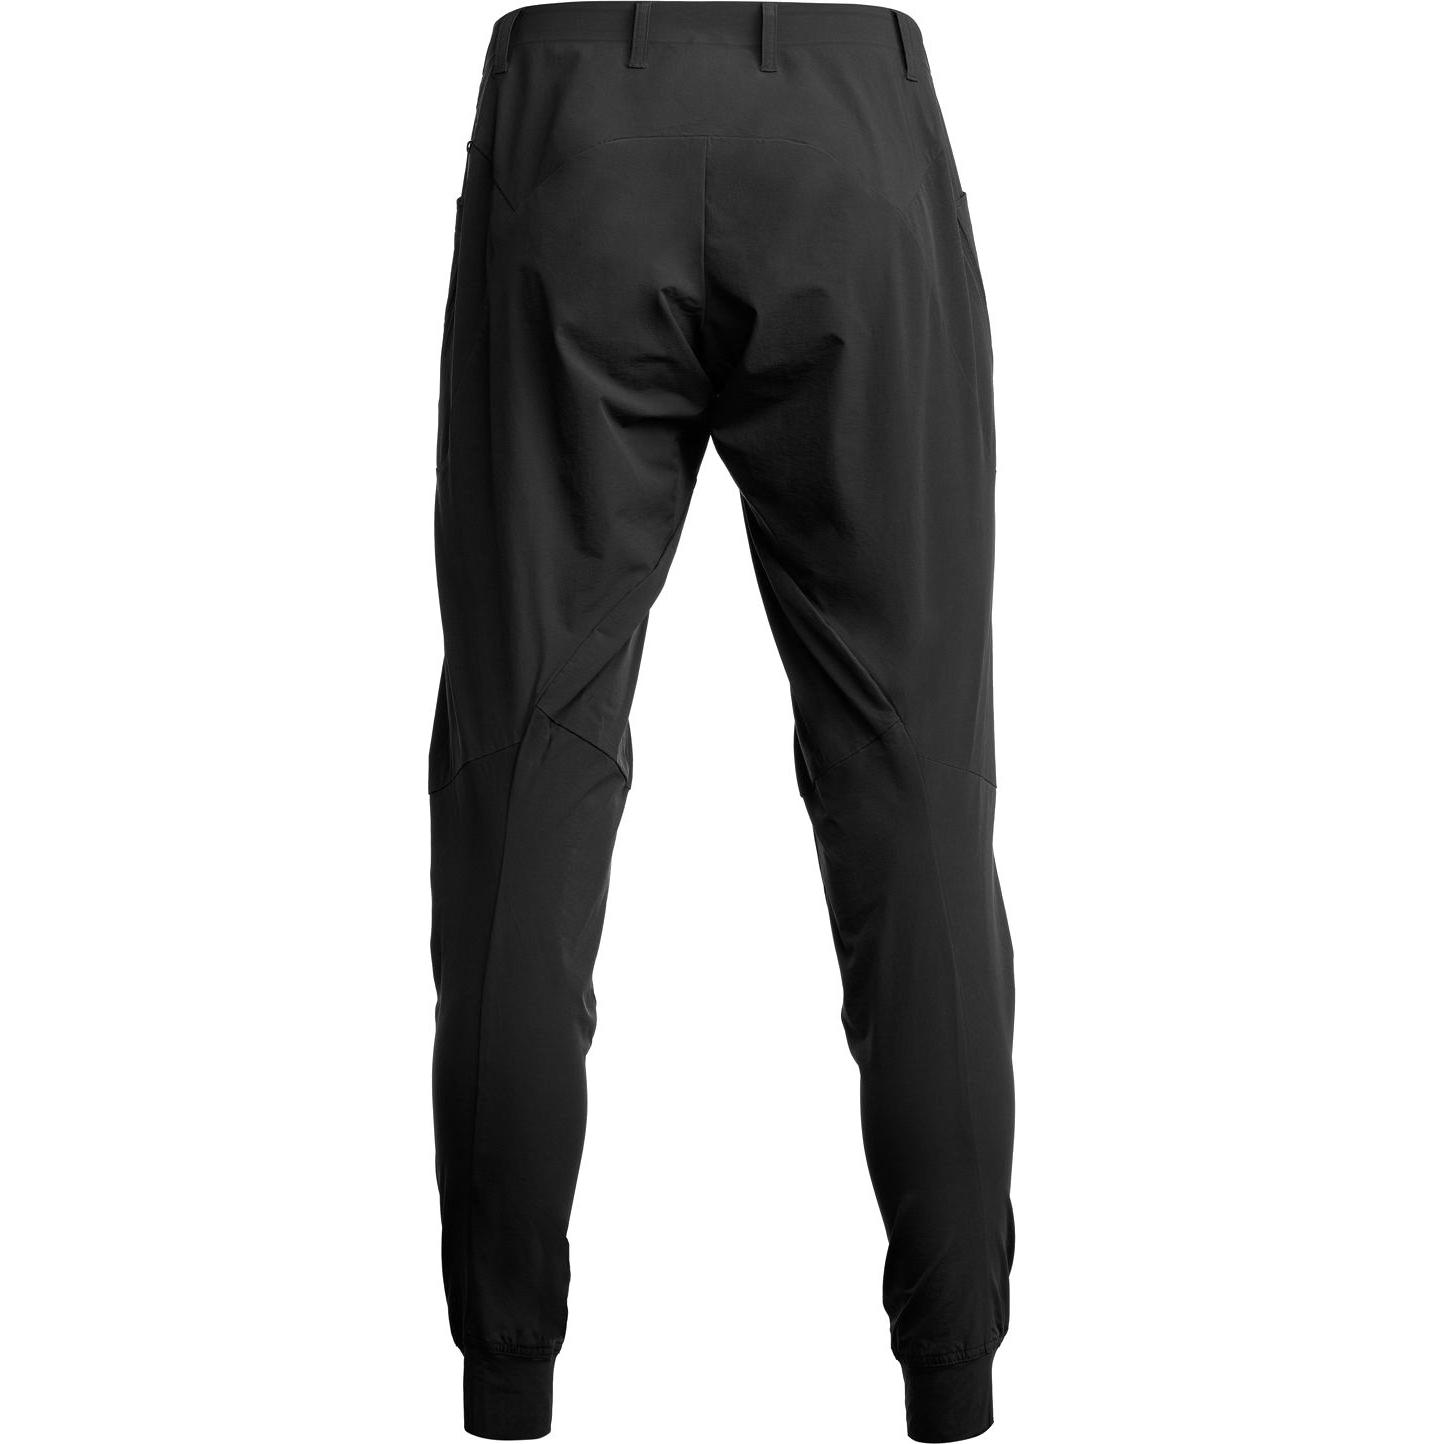 Imagen de 7mesh Glidepath Pantalones Mujer - negro